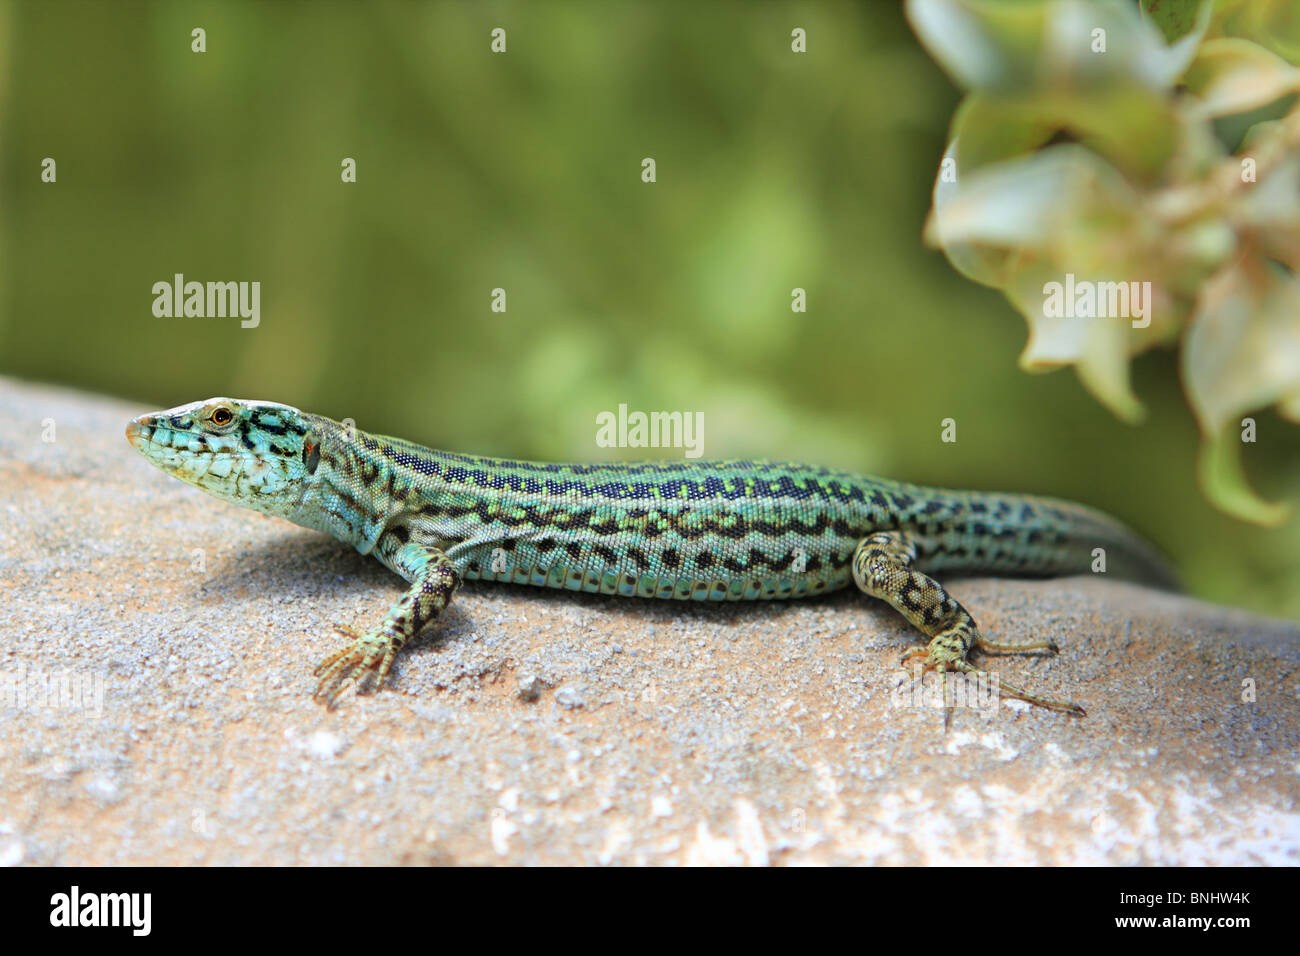 Formentera Gecko Eidechse Podarcis Pityusensis formenterae Stockbild